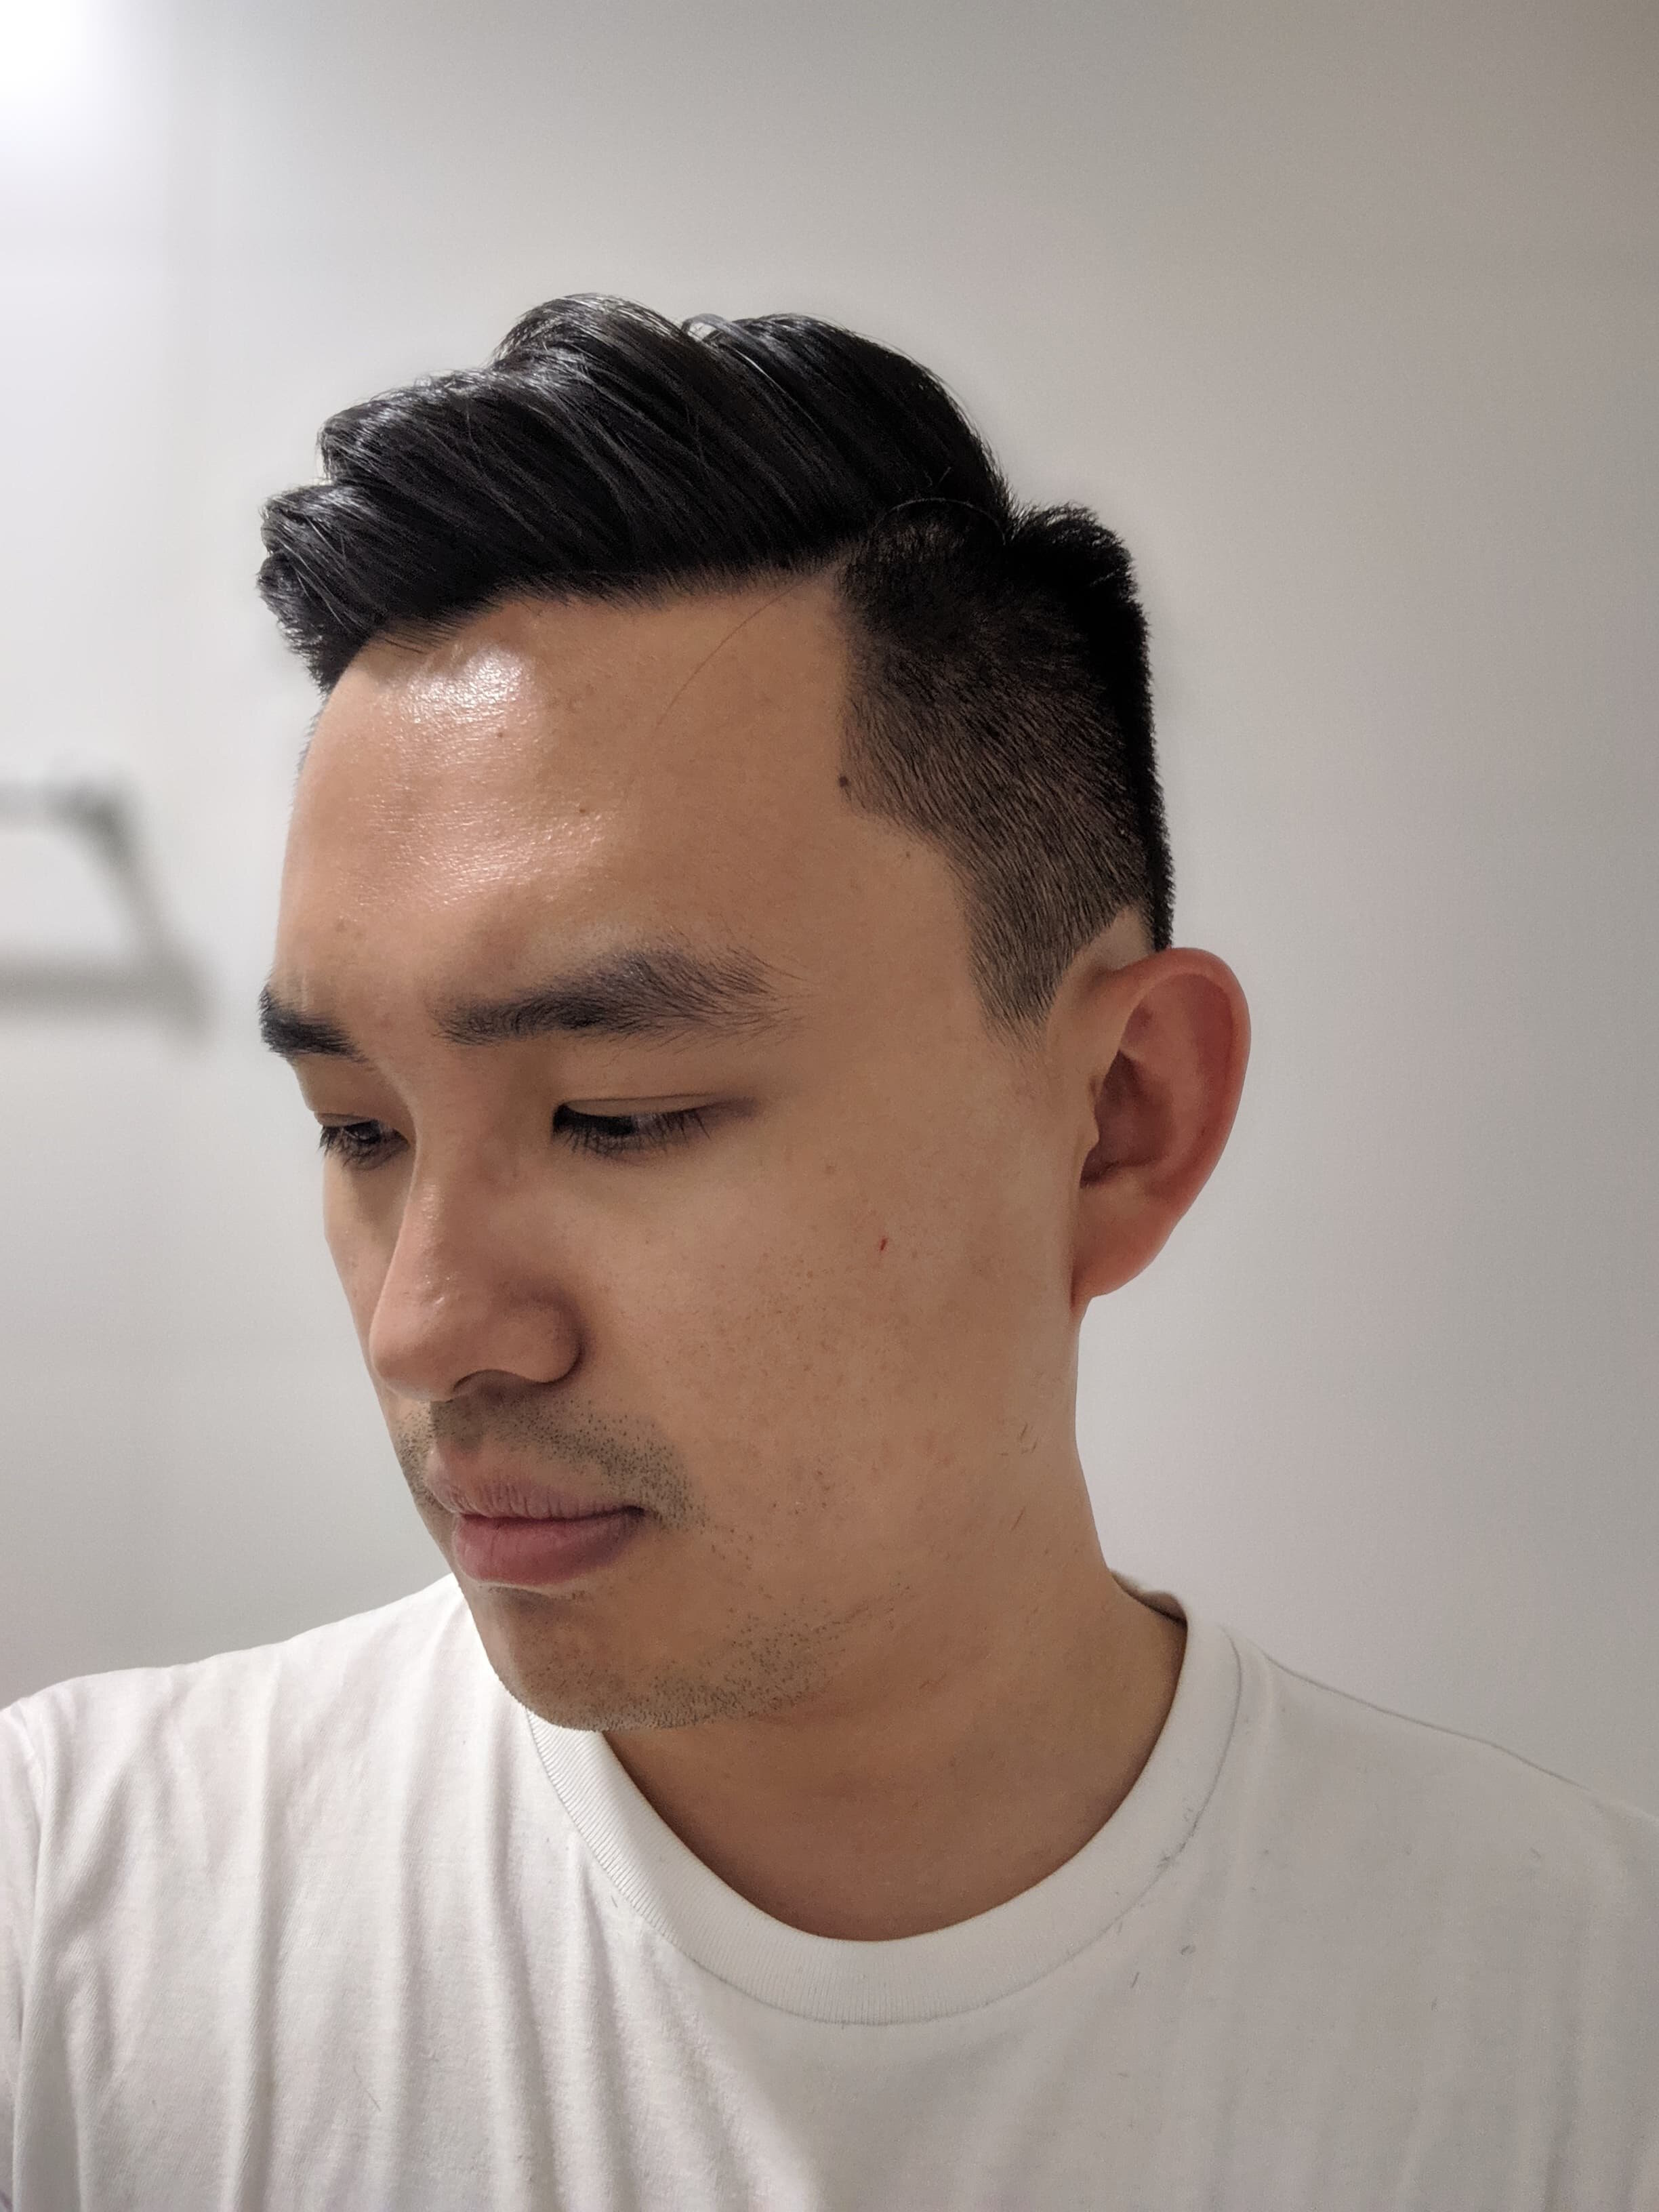 LA Barbershop Hair Cut Review - Side View